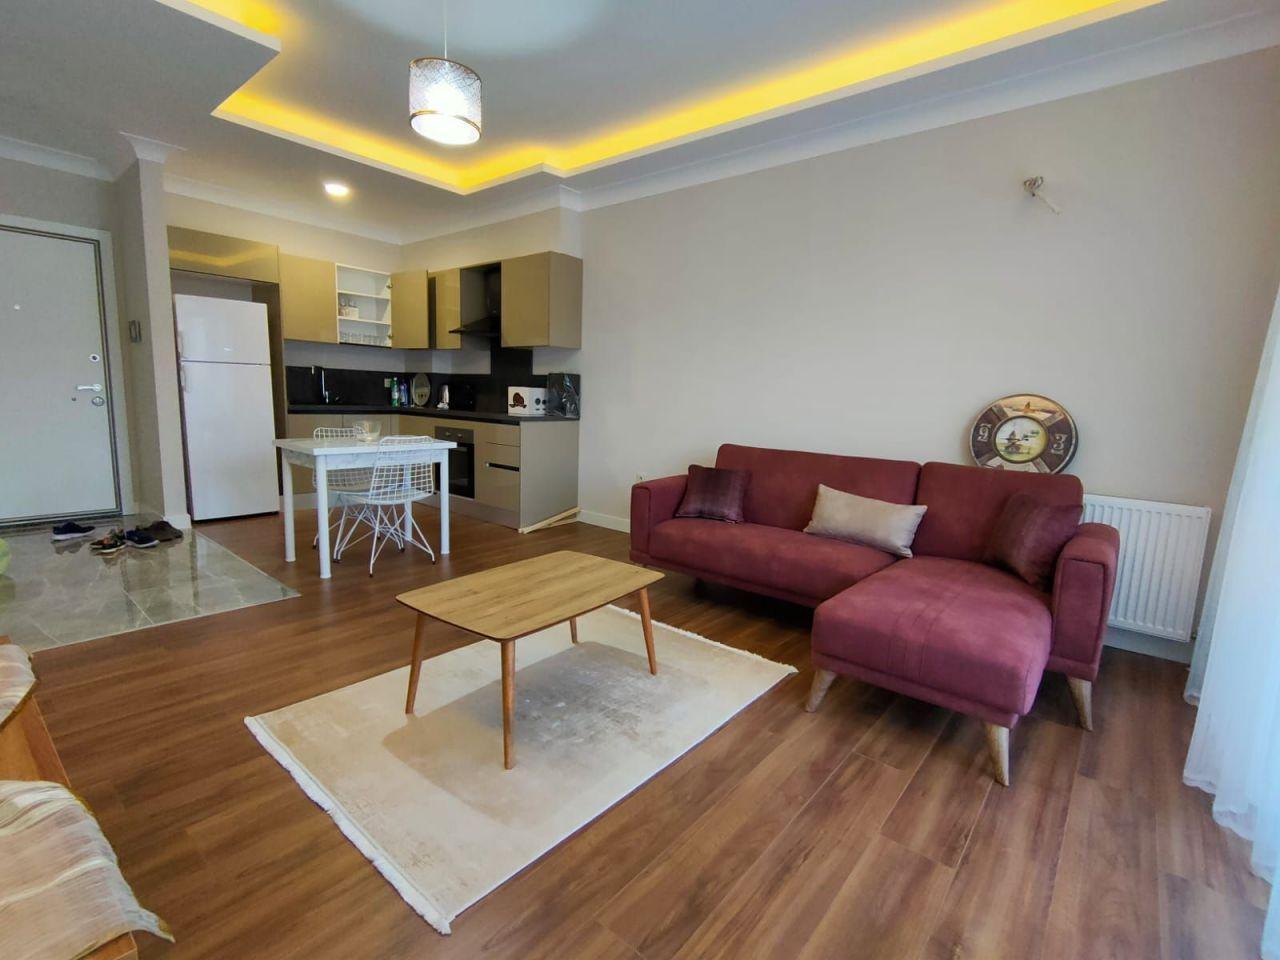 Квартира в болгарии цена отдых на крите отели 3 звезды и аппартаменты